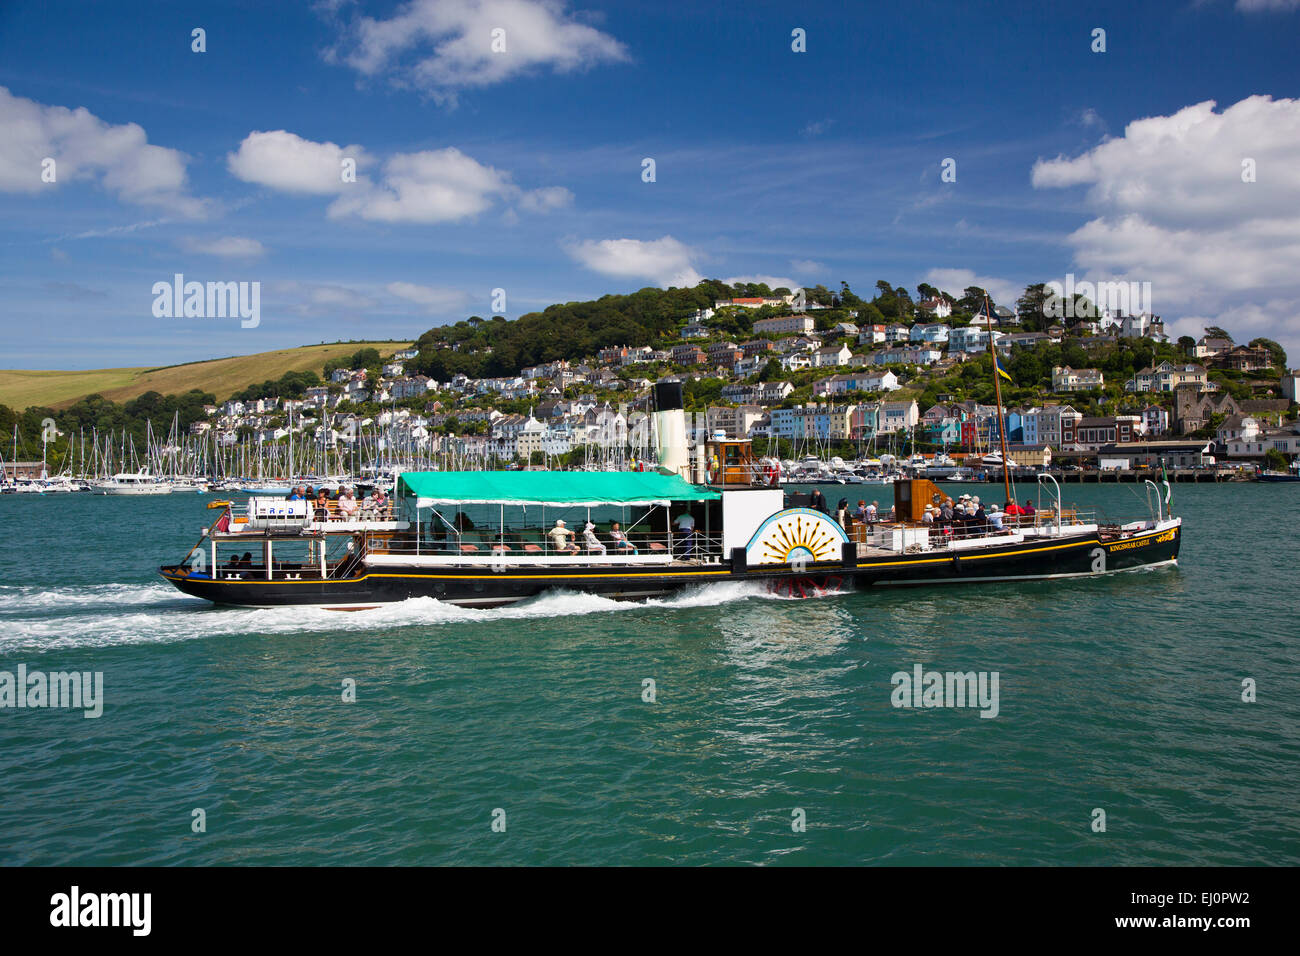 Kingswear, Dartmouth, South Hams, Devon, South-West England, Britain, UK, Europe, British, English, south coast, - Stock Image